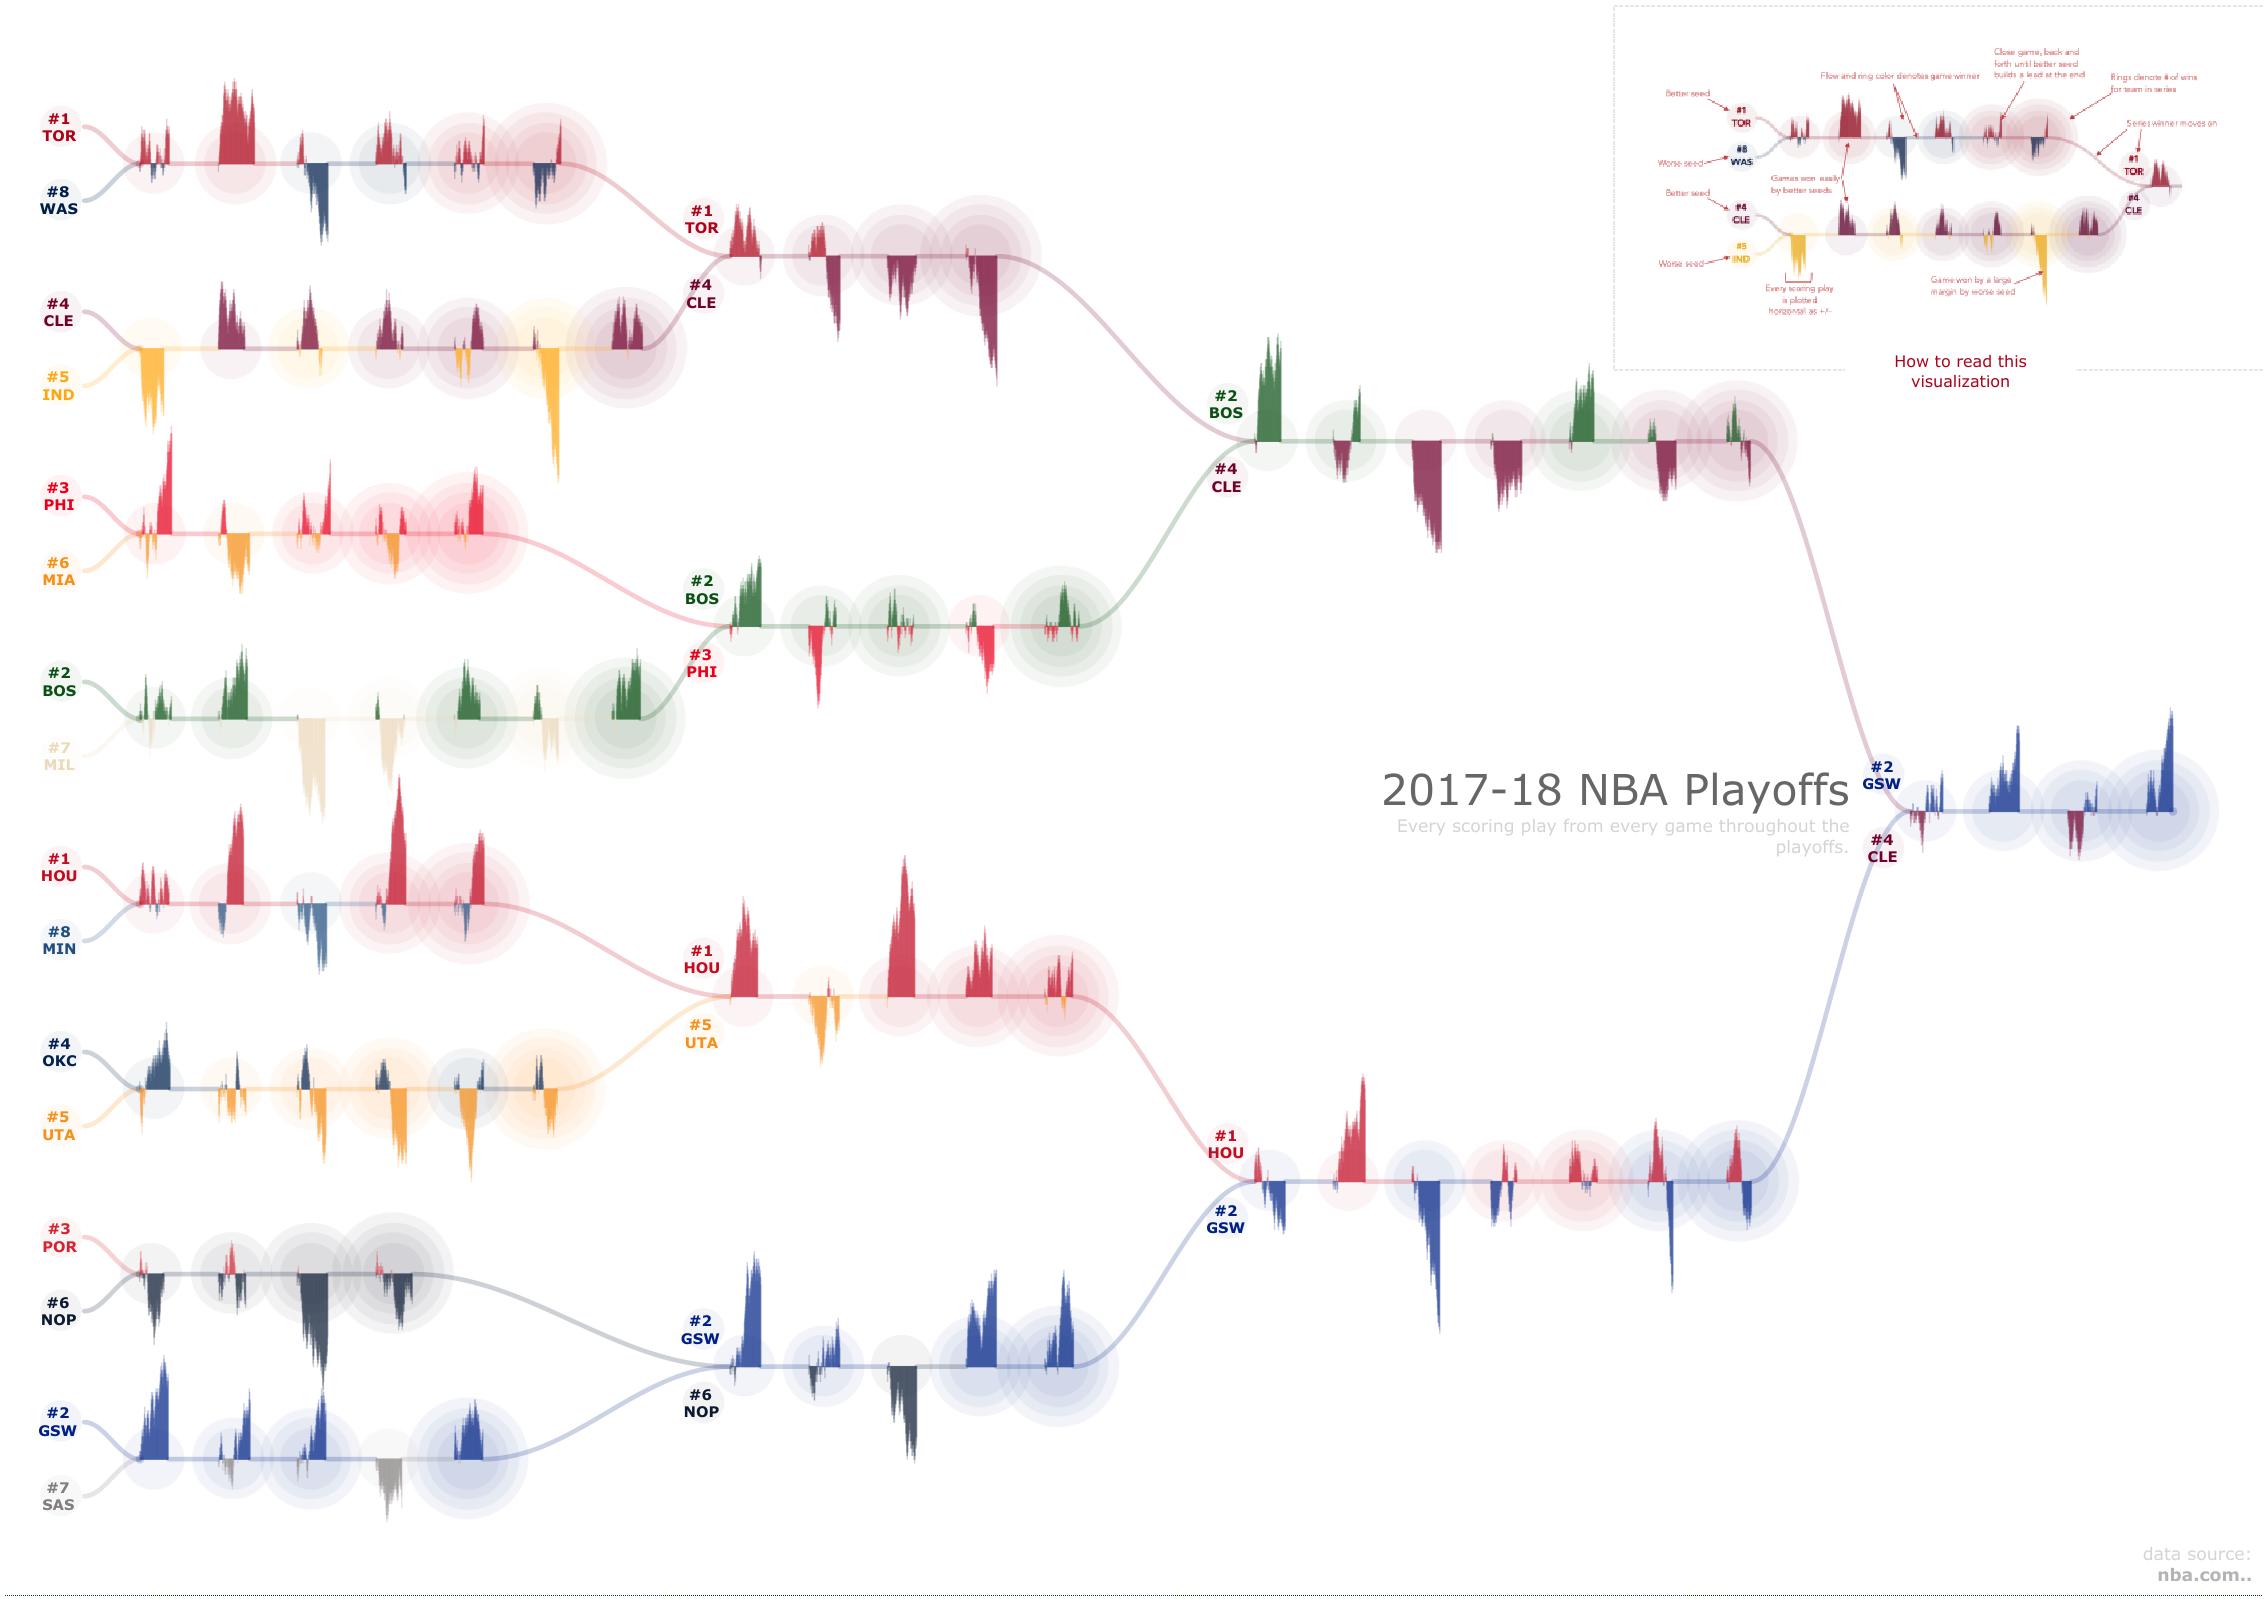 NBA Playoffs 2018 by Chris DeMartini